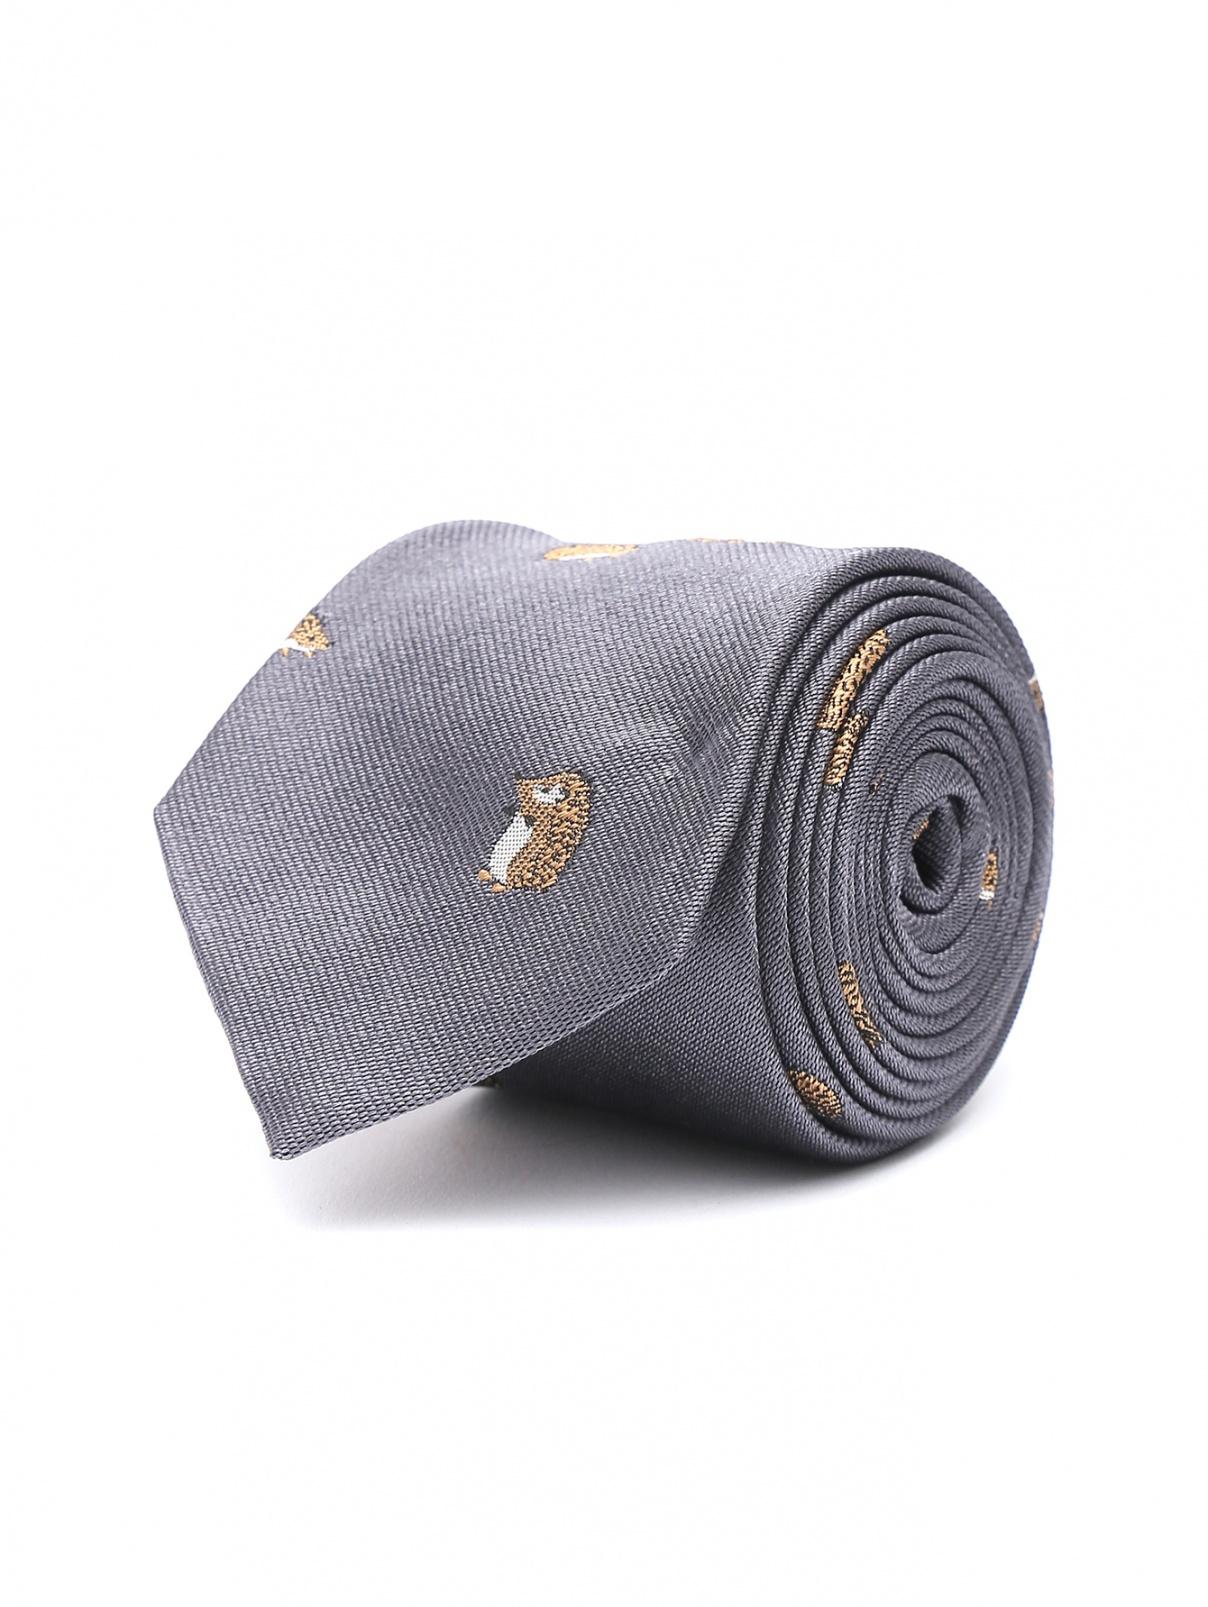 Галстук из шелка с узором Paul Smith  –  Общий вид